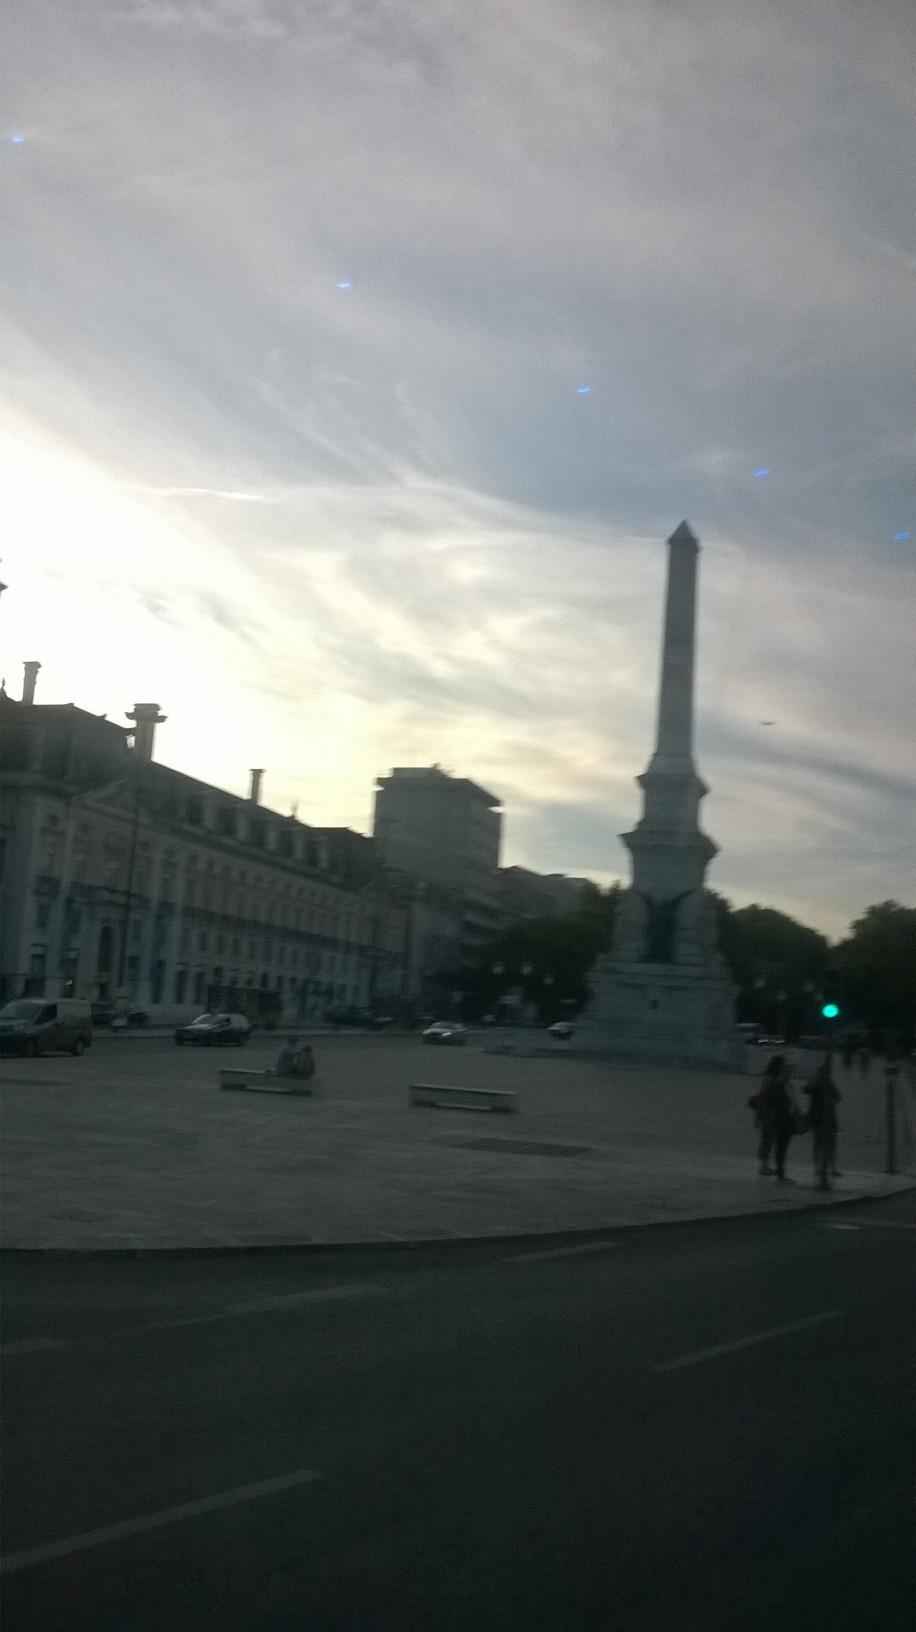 lisbon-placa-de-restaraudores-obelisk-my15